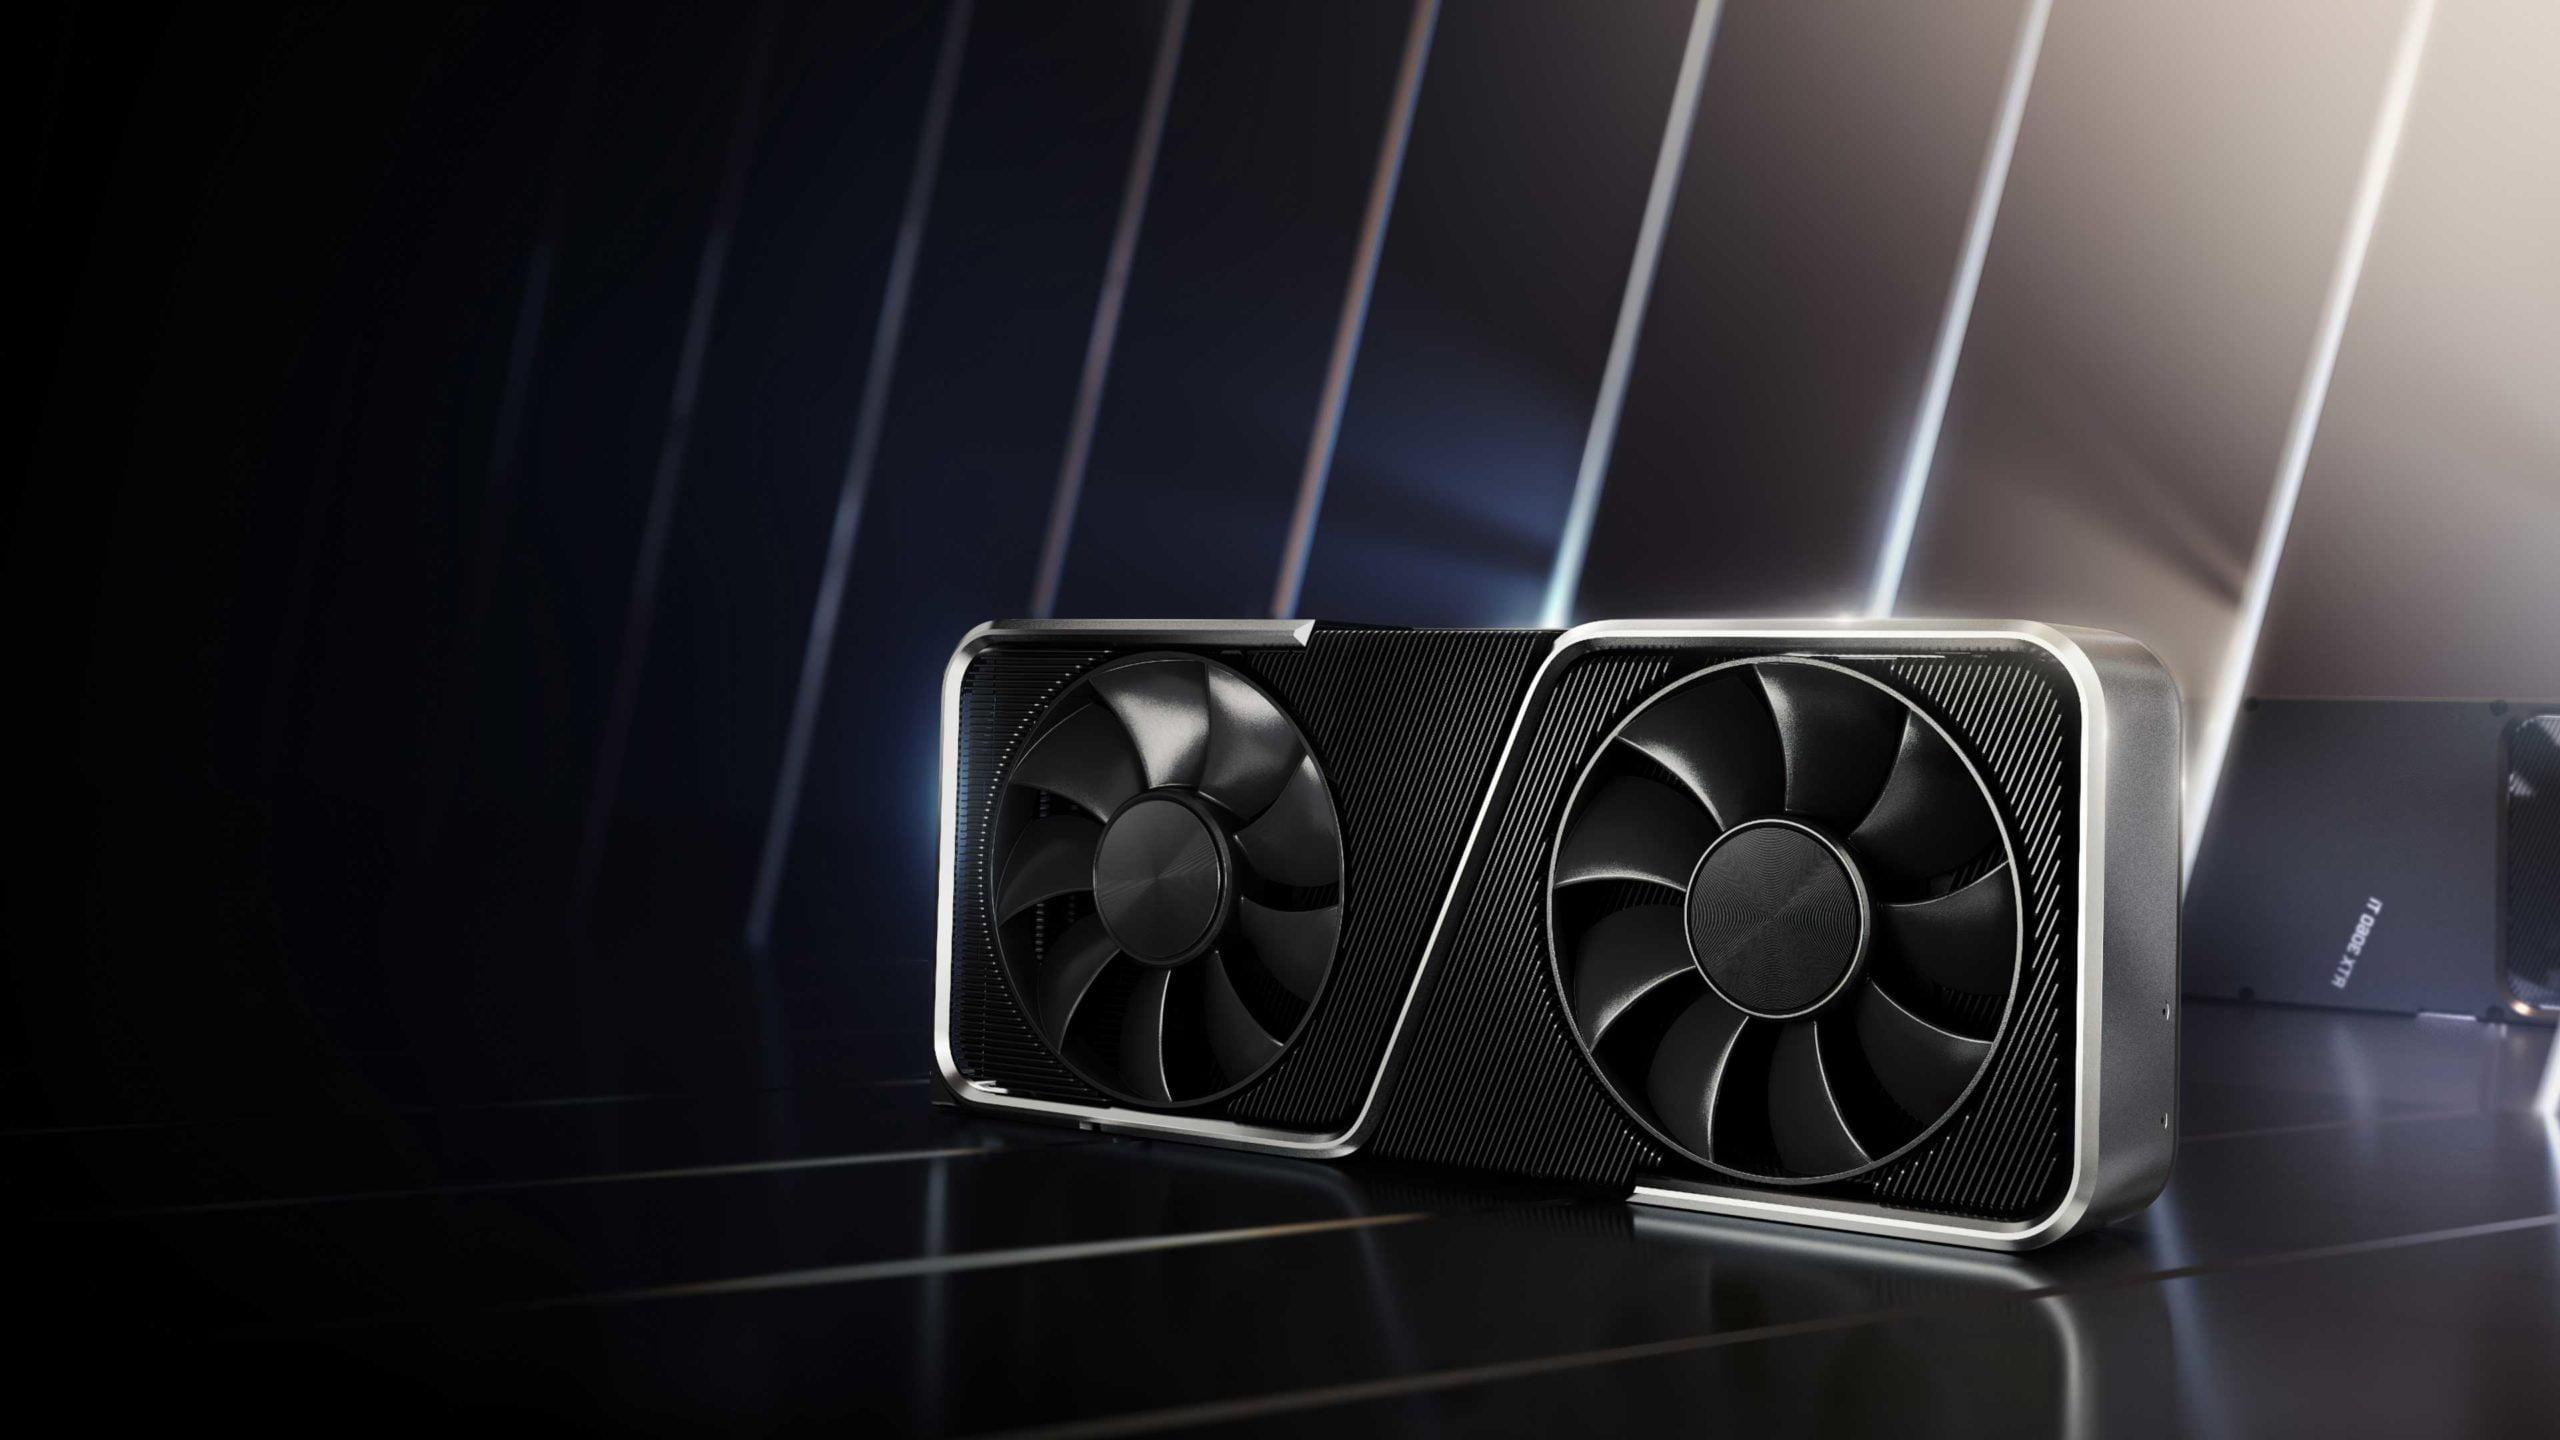 Nvidias RTX 3060 Ti